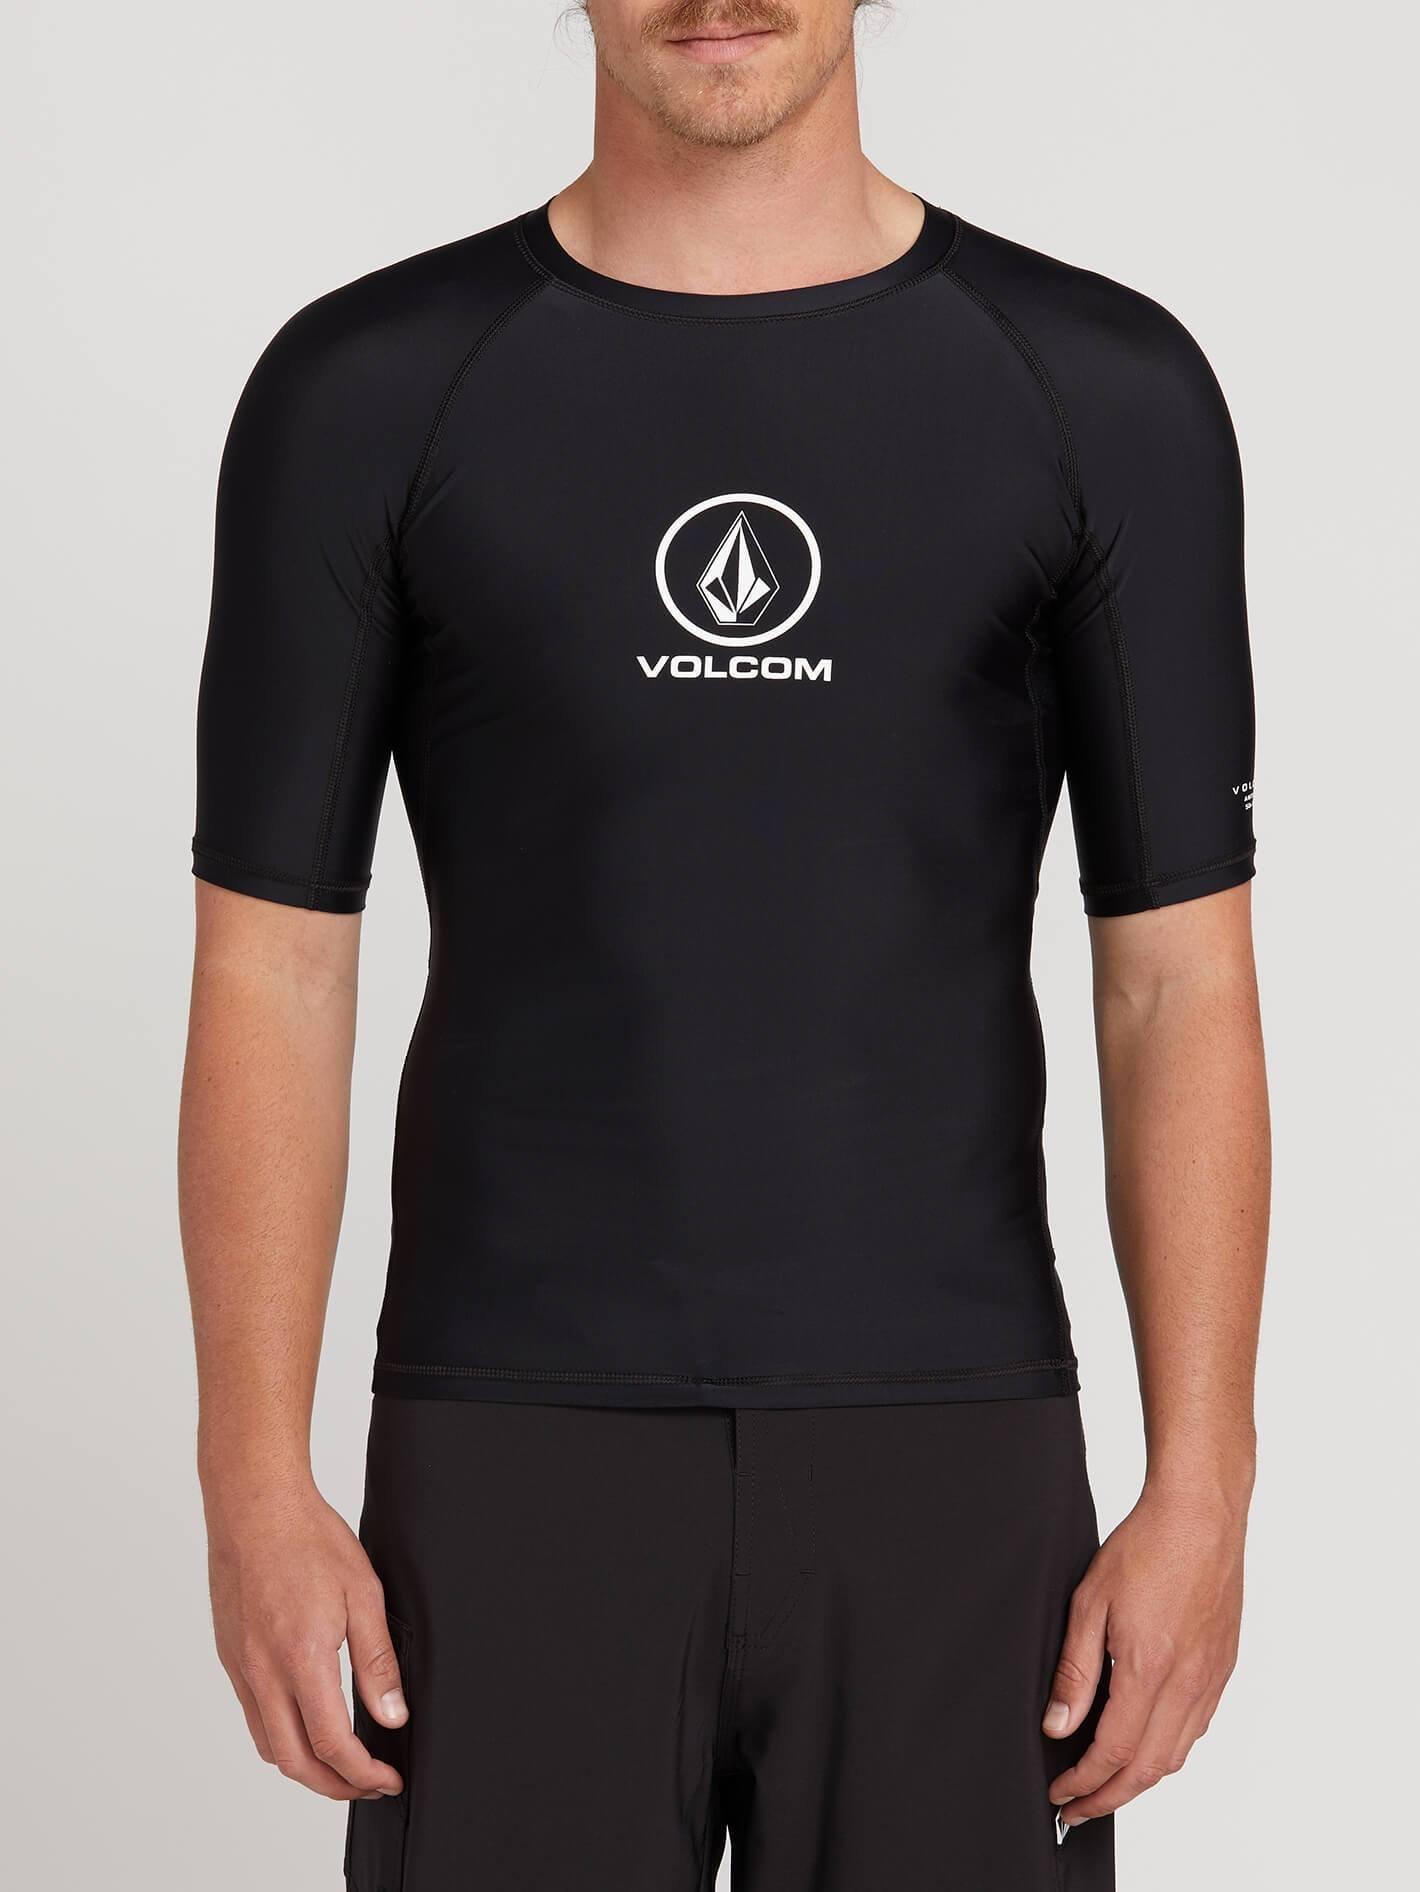 Volcom Lido Solid Short Sleeve Rashguard M